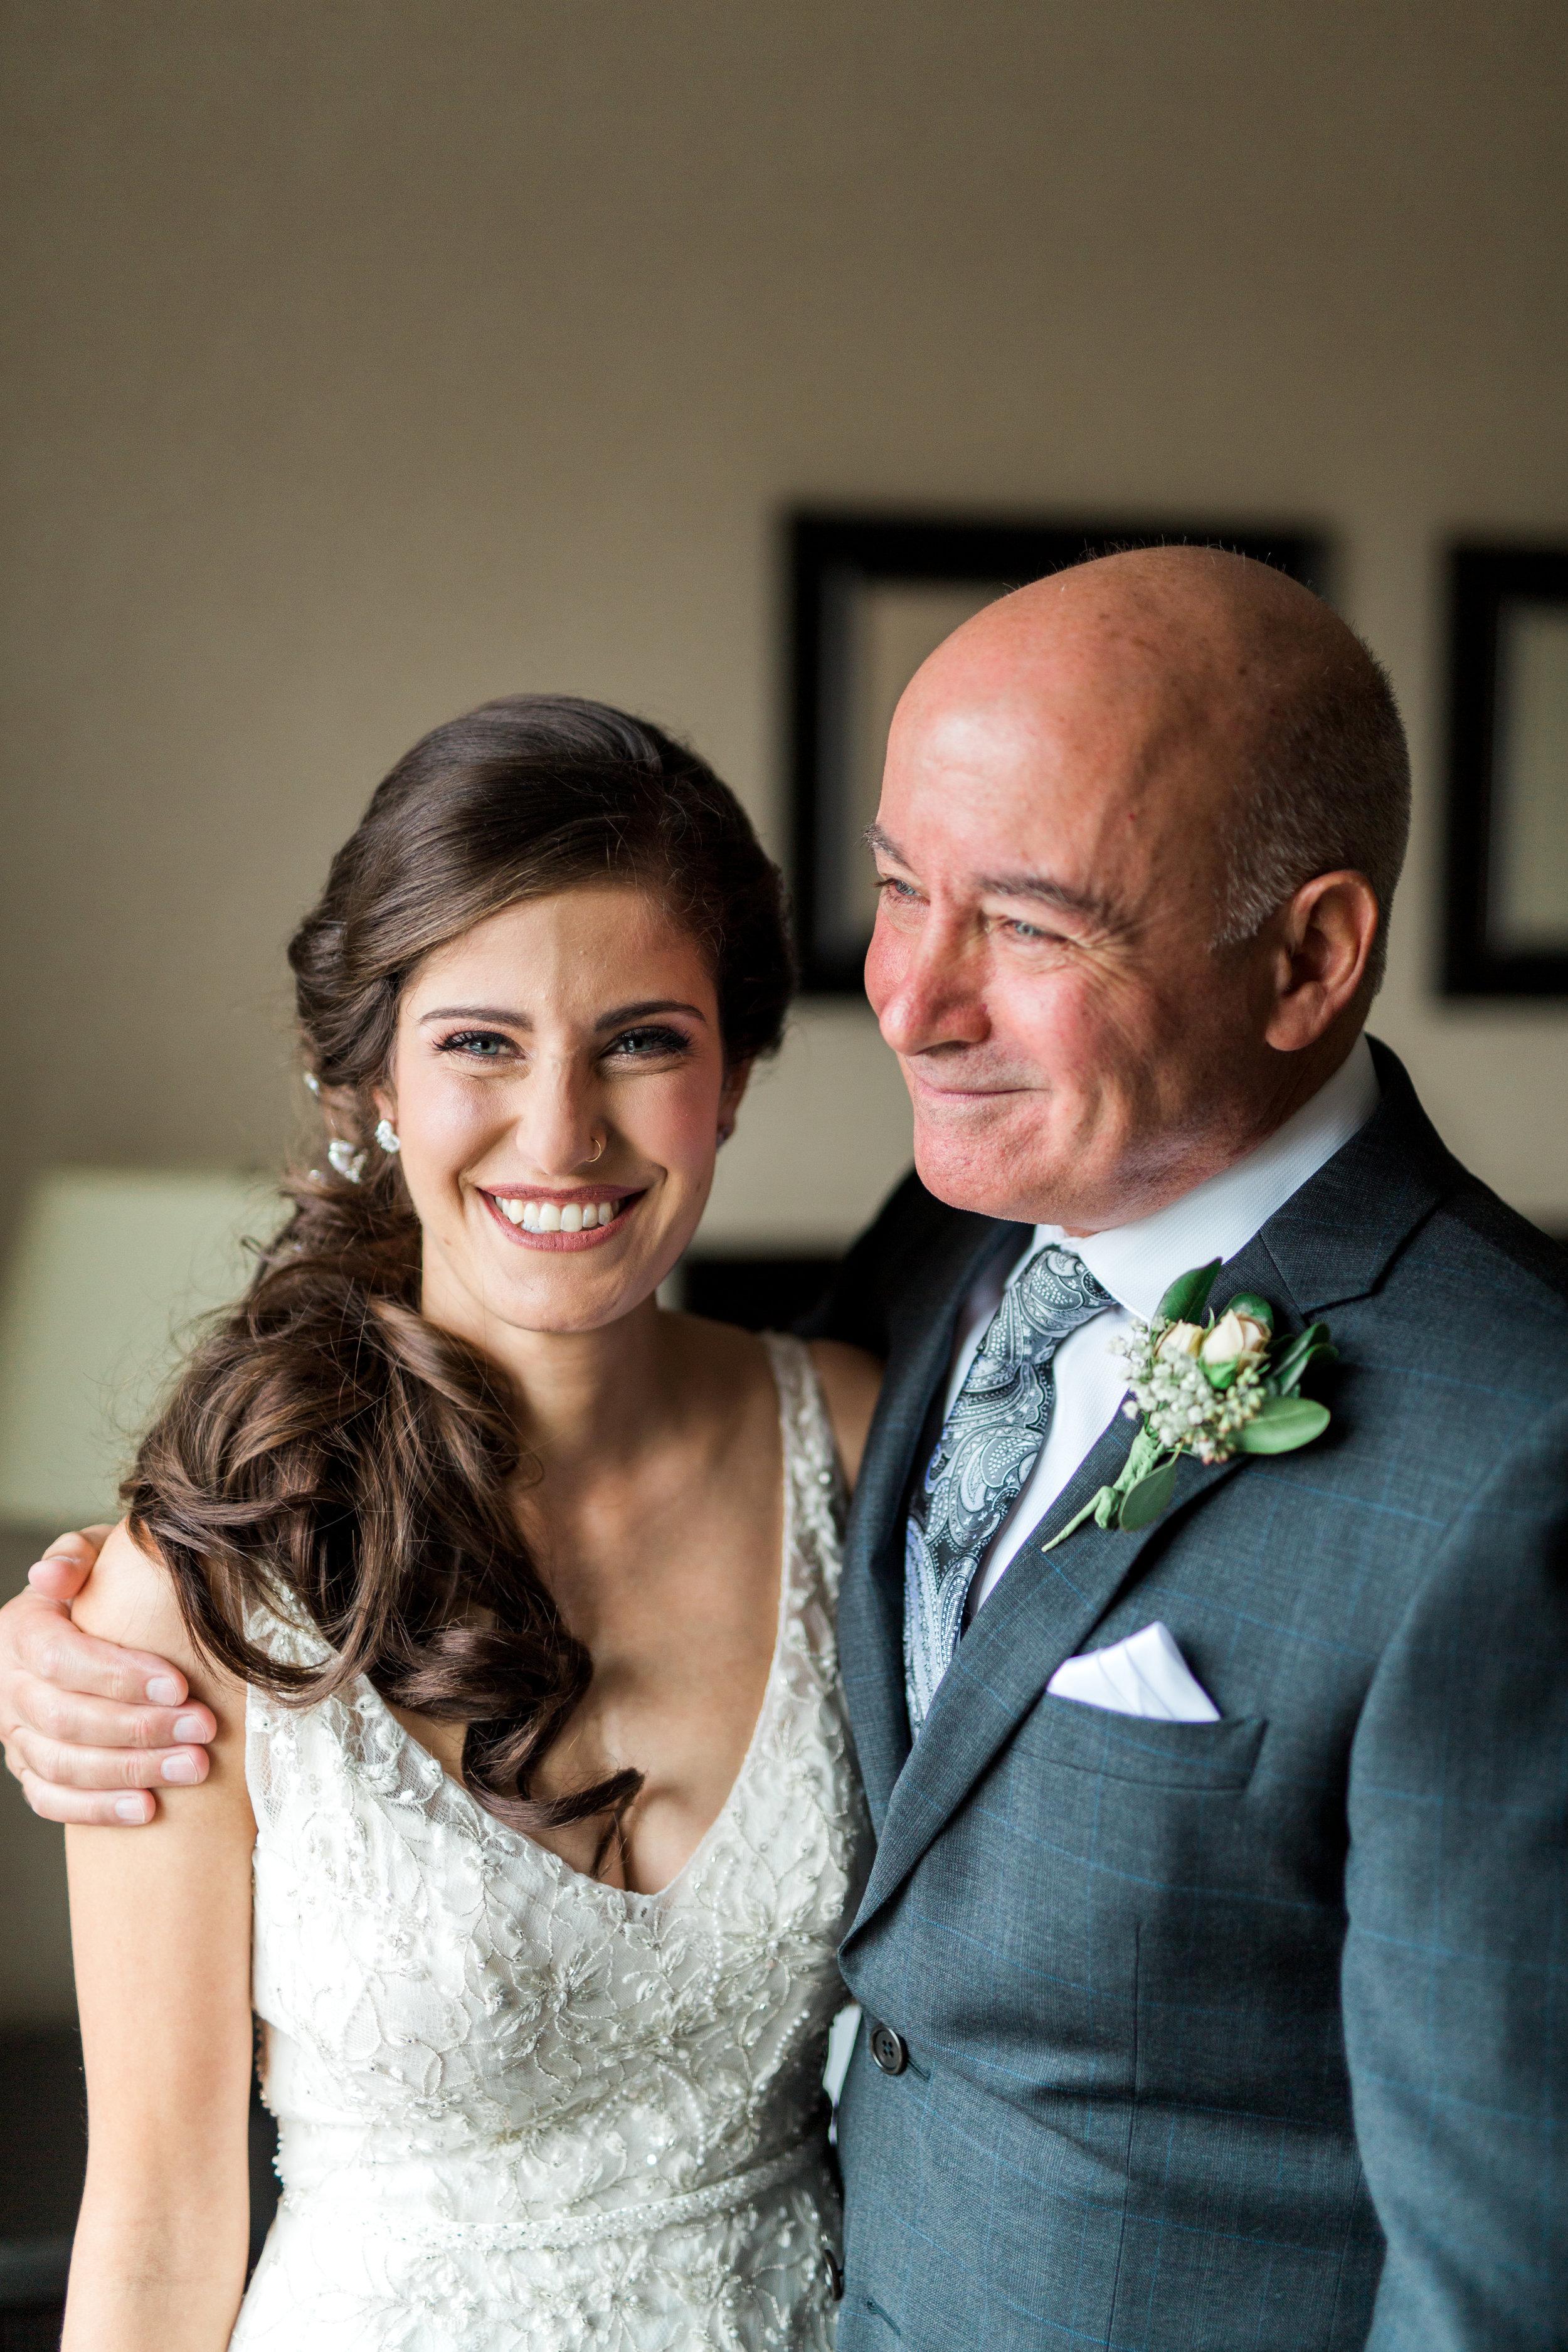 Amir-Golbazi-Danielle-Giroux-Photography_Toronto-Wedding_Cedarwood_Rachel-Paul_114.jpg